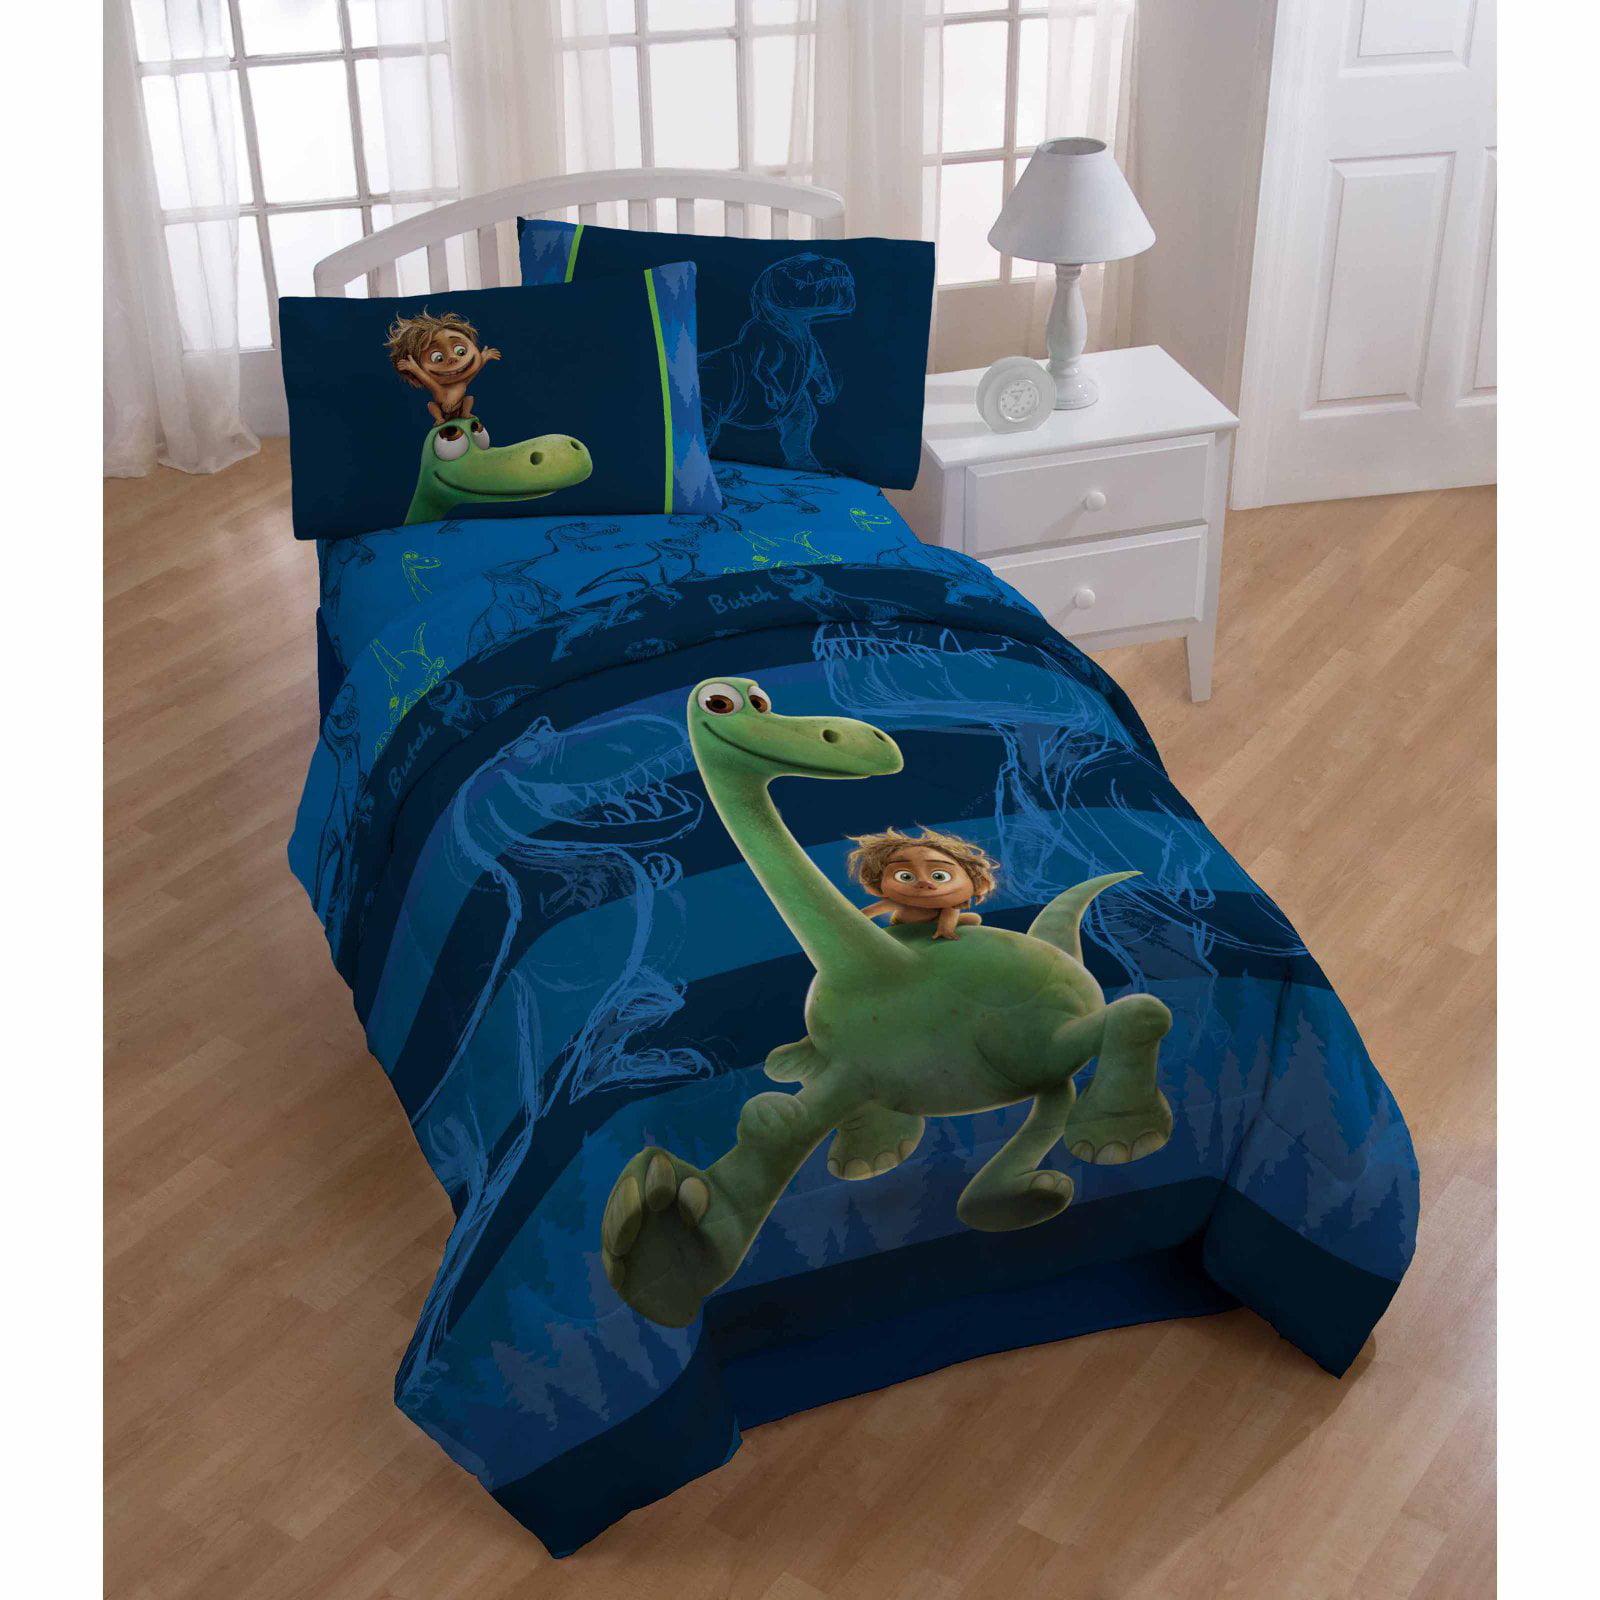 The Good Dinosaur Carnivore Reversible Comforter Disney